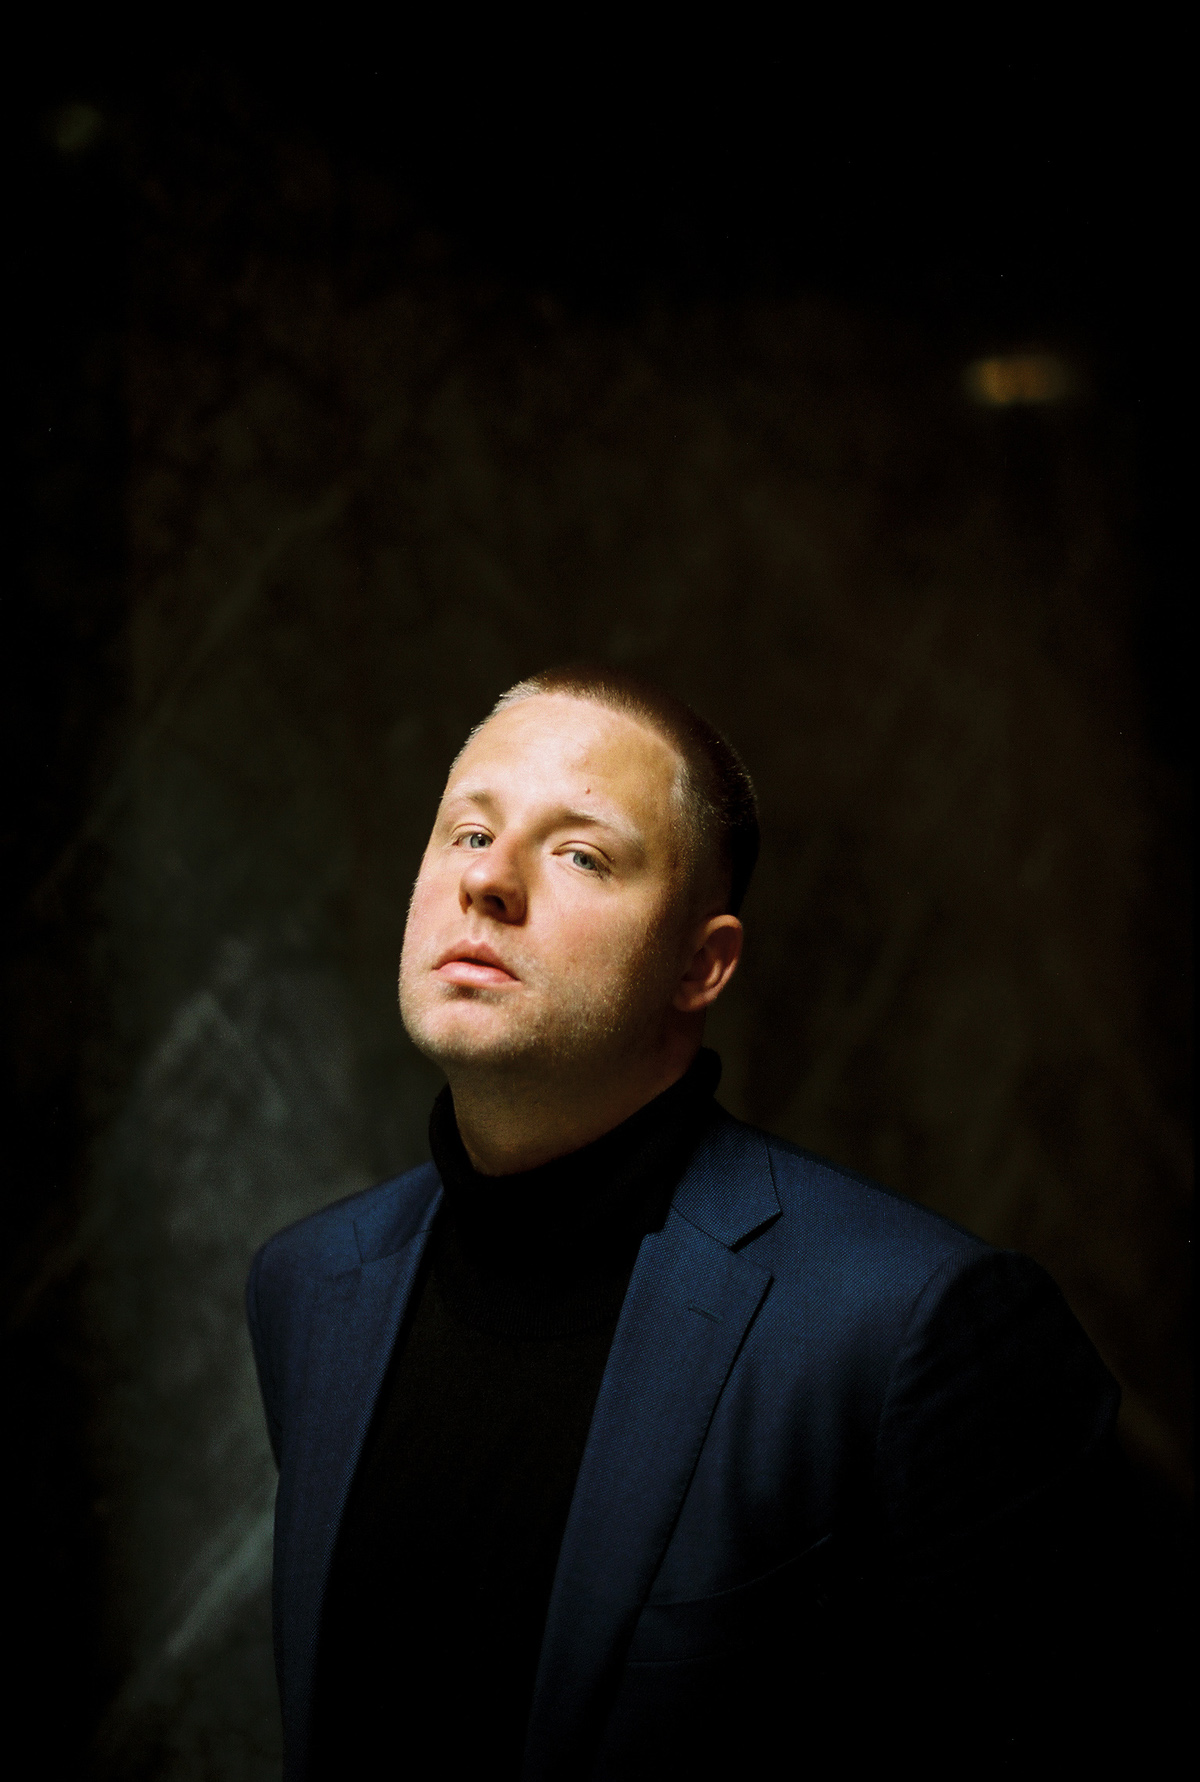 Simon Habegger Wingwall Filip Galkovski Unternehmer Unternehmensberatung